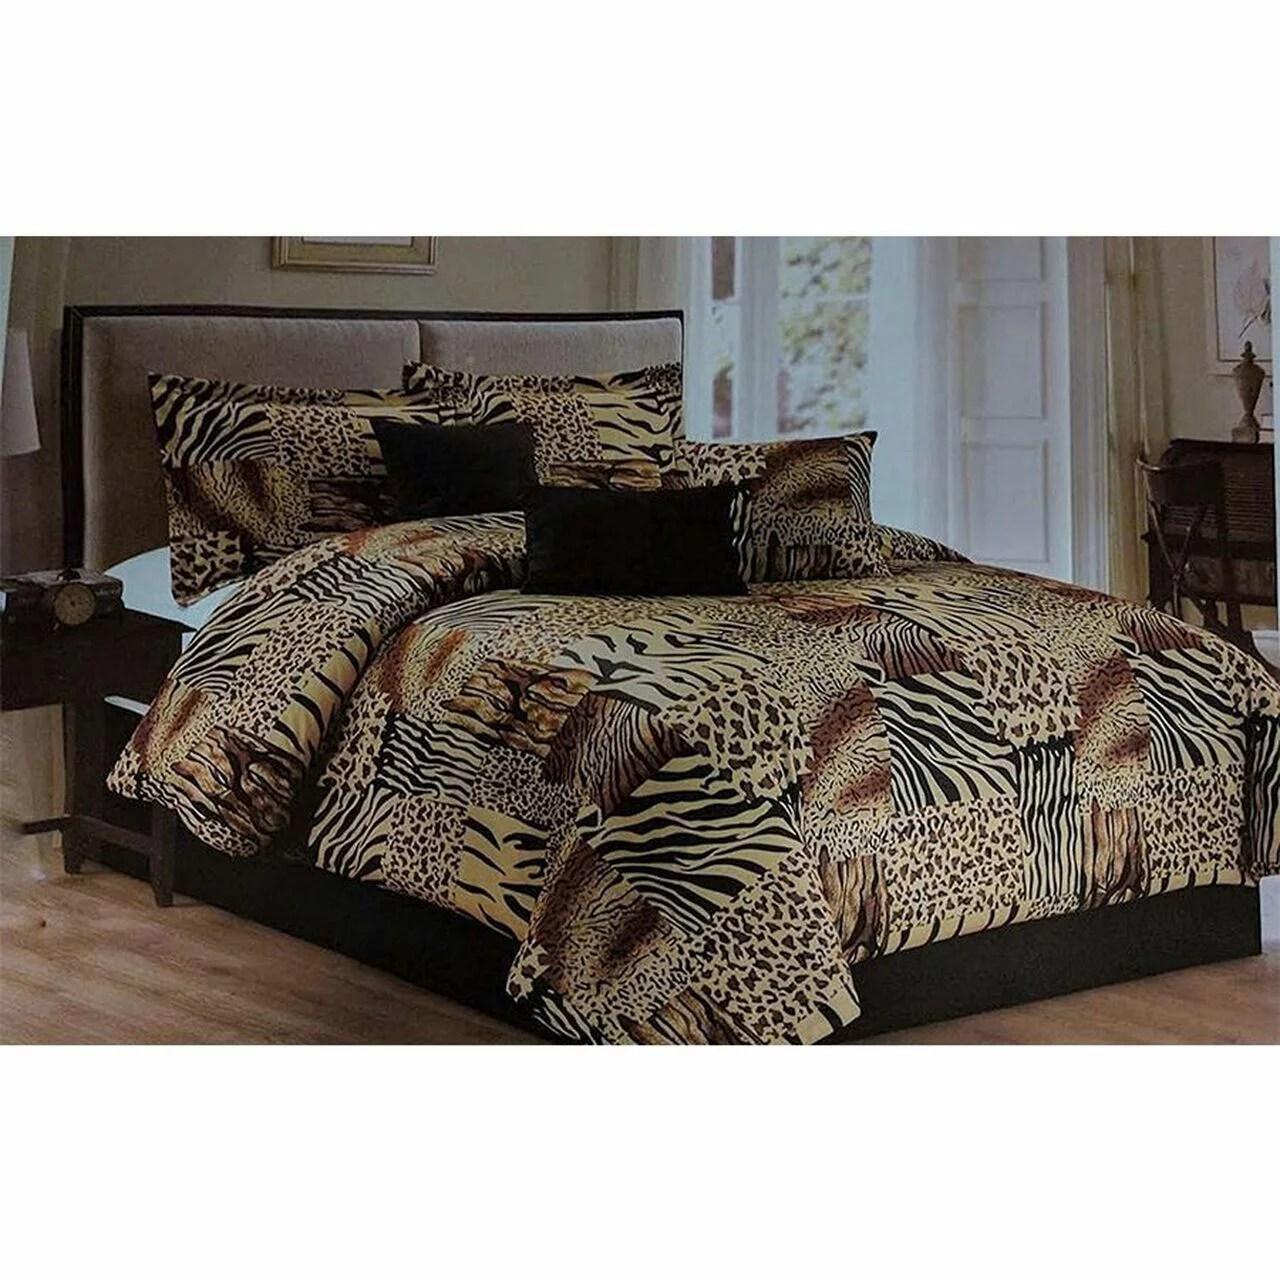 5 pc multi animal print black brown tan and charcoal grey microfur comforter set walmart com